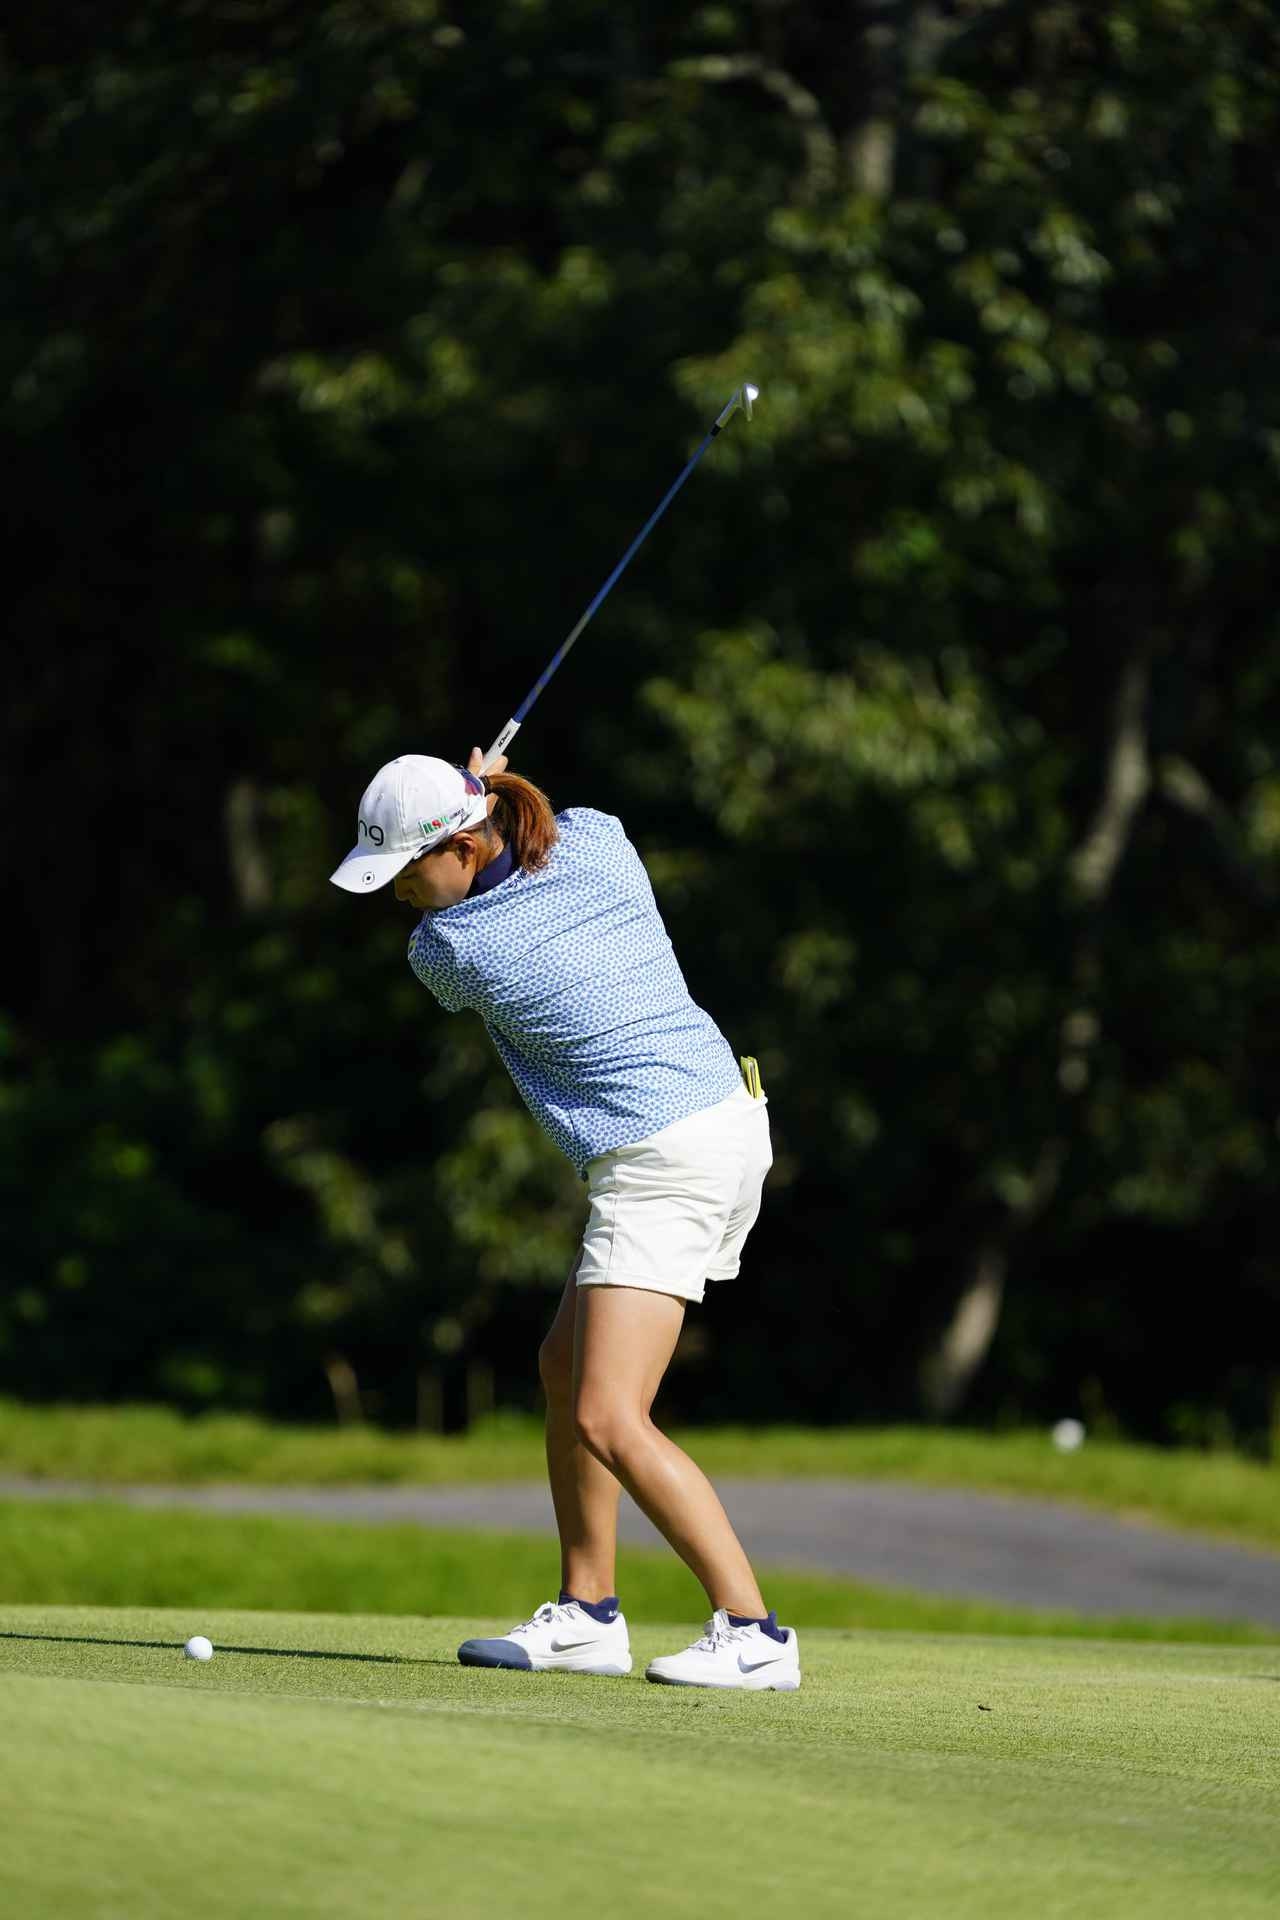 Images : 6番目の画像 - 渋野日向子 アイアン連続写真 - みんなのゴルフダイジェスト